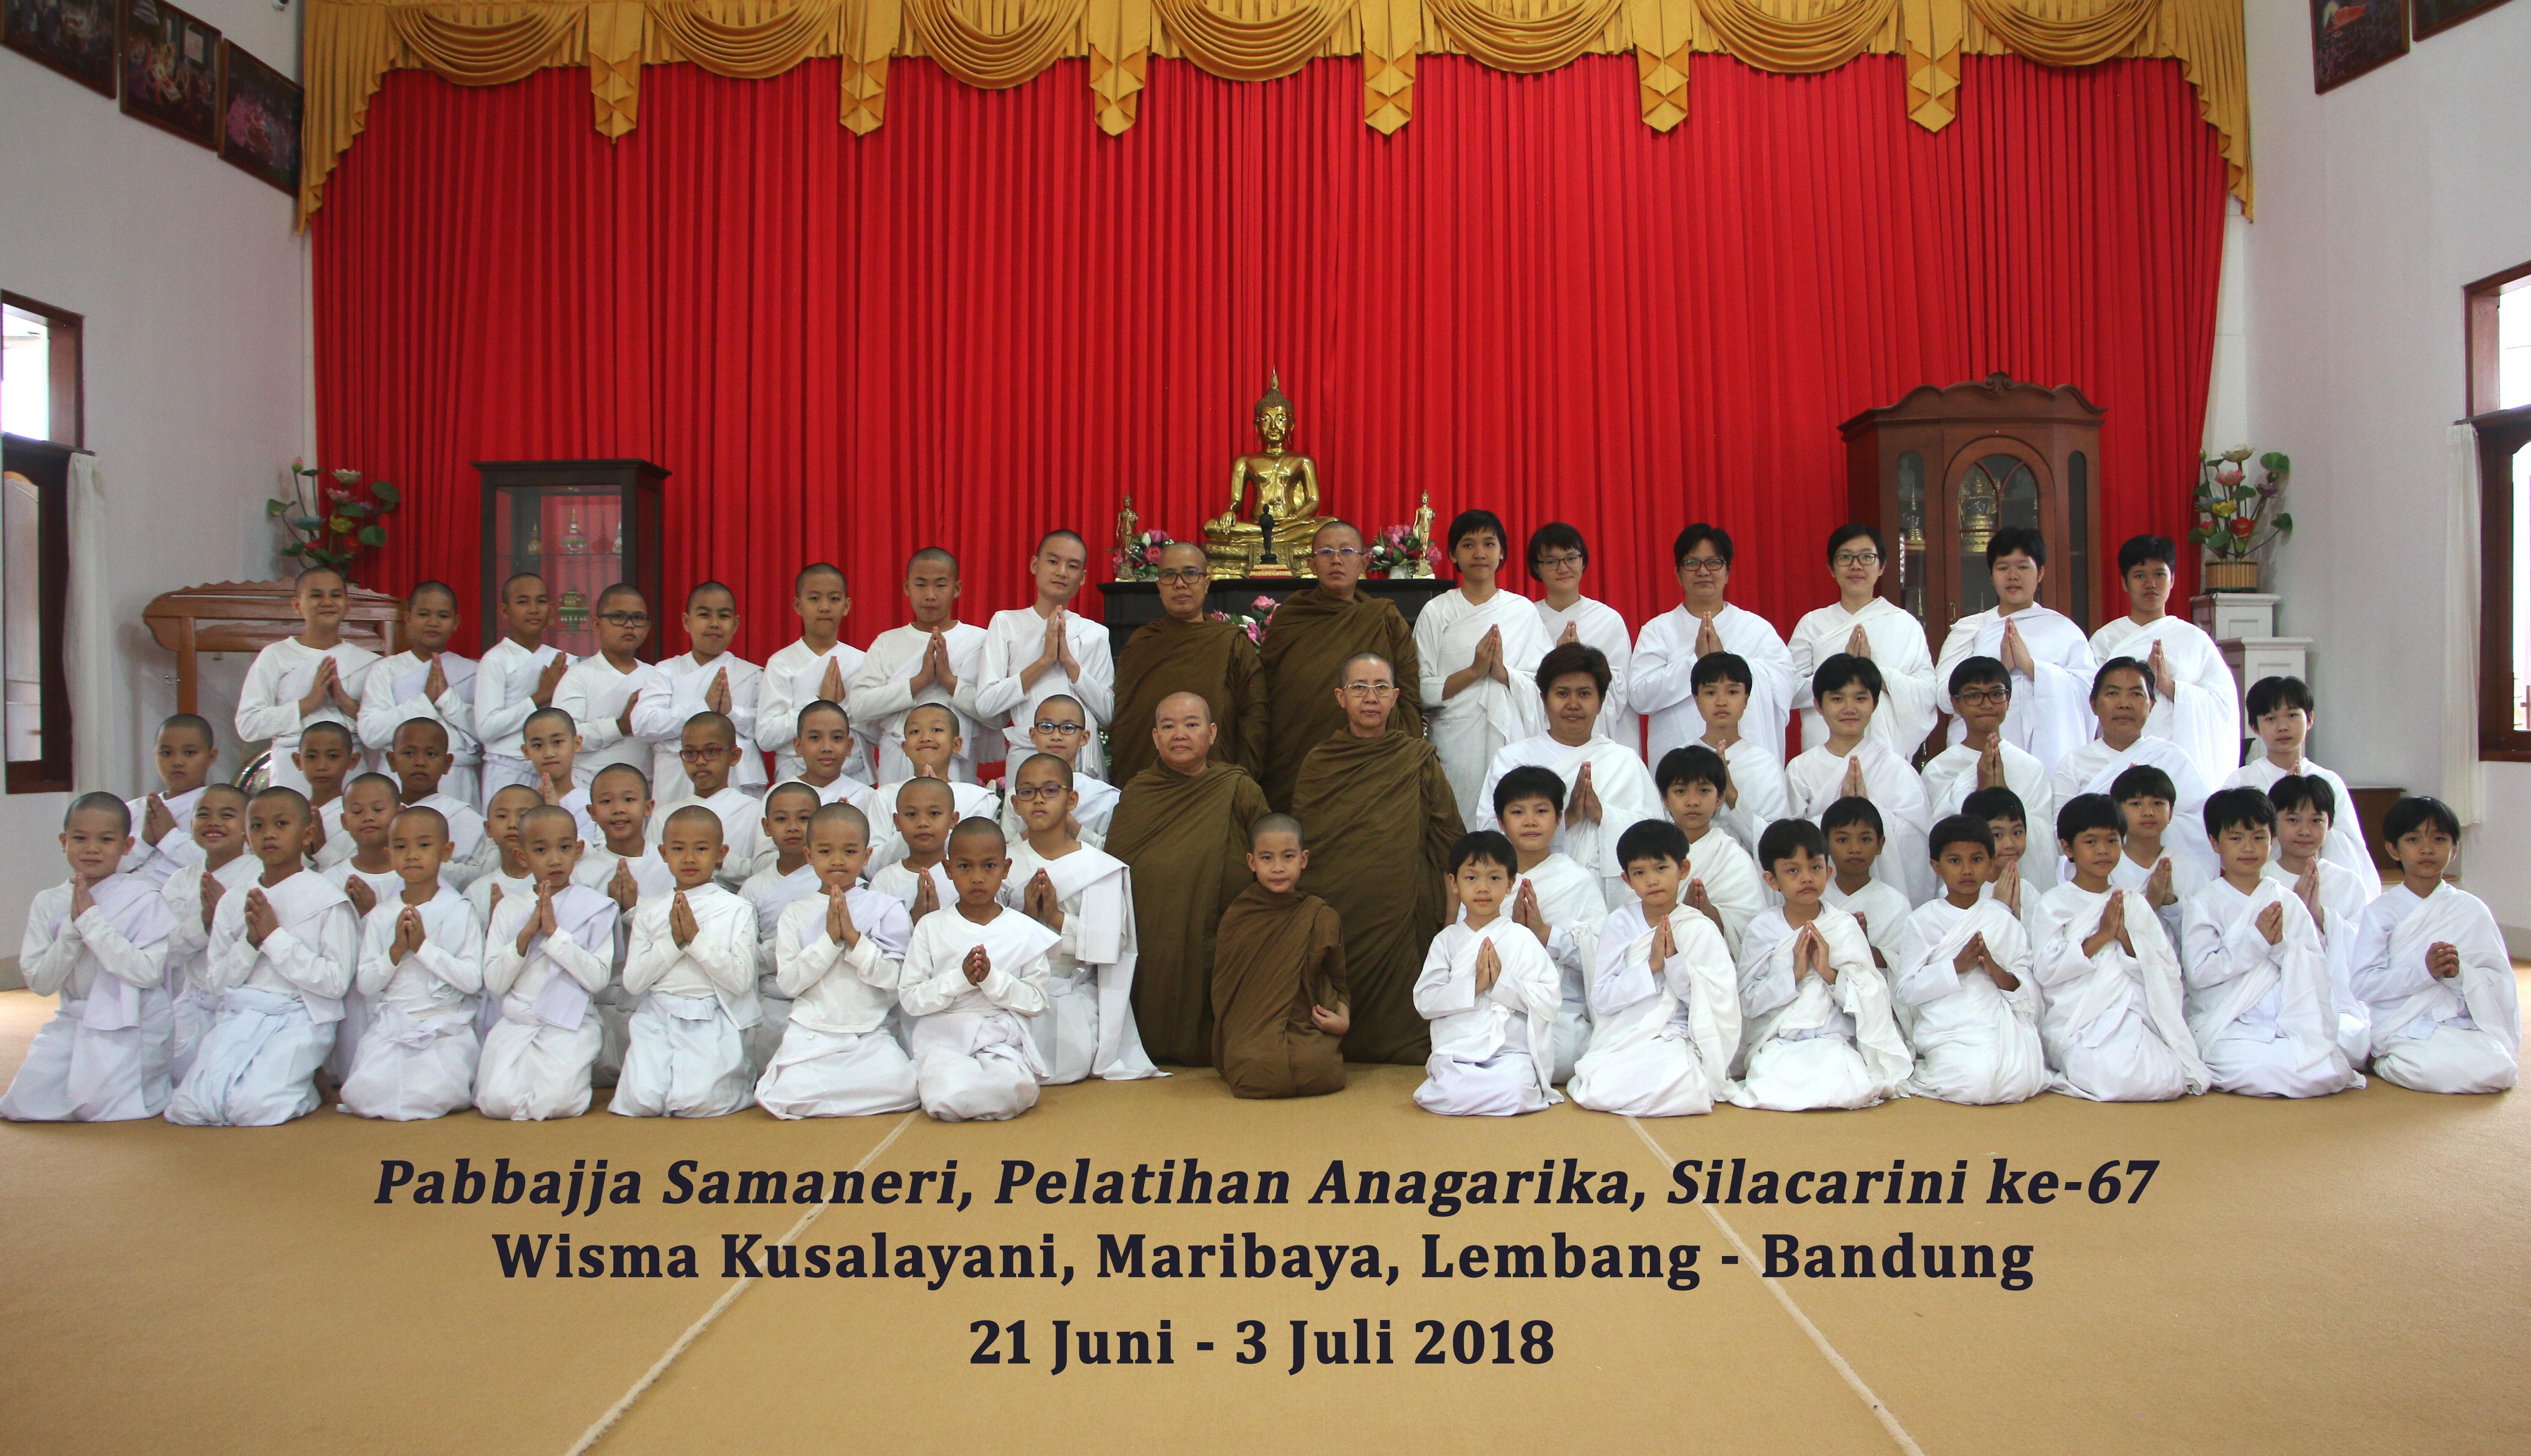 Liputan Pabbajja Samaneri, Pelatihan Anagarika dan Silacarini ke-67 (Juni- Juli 2018)